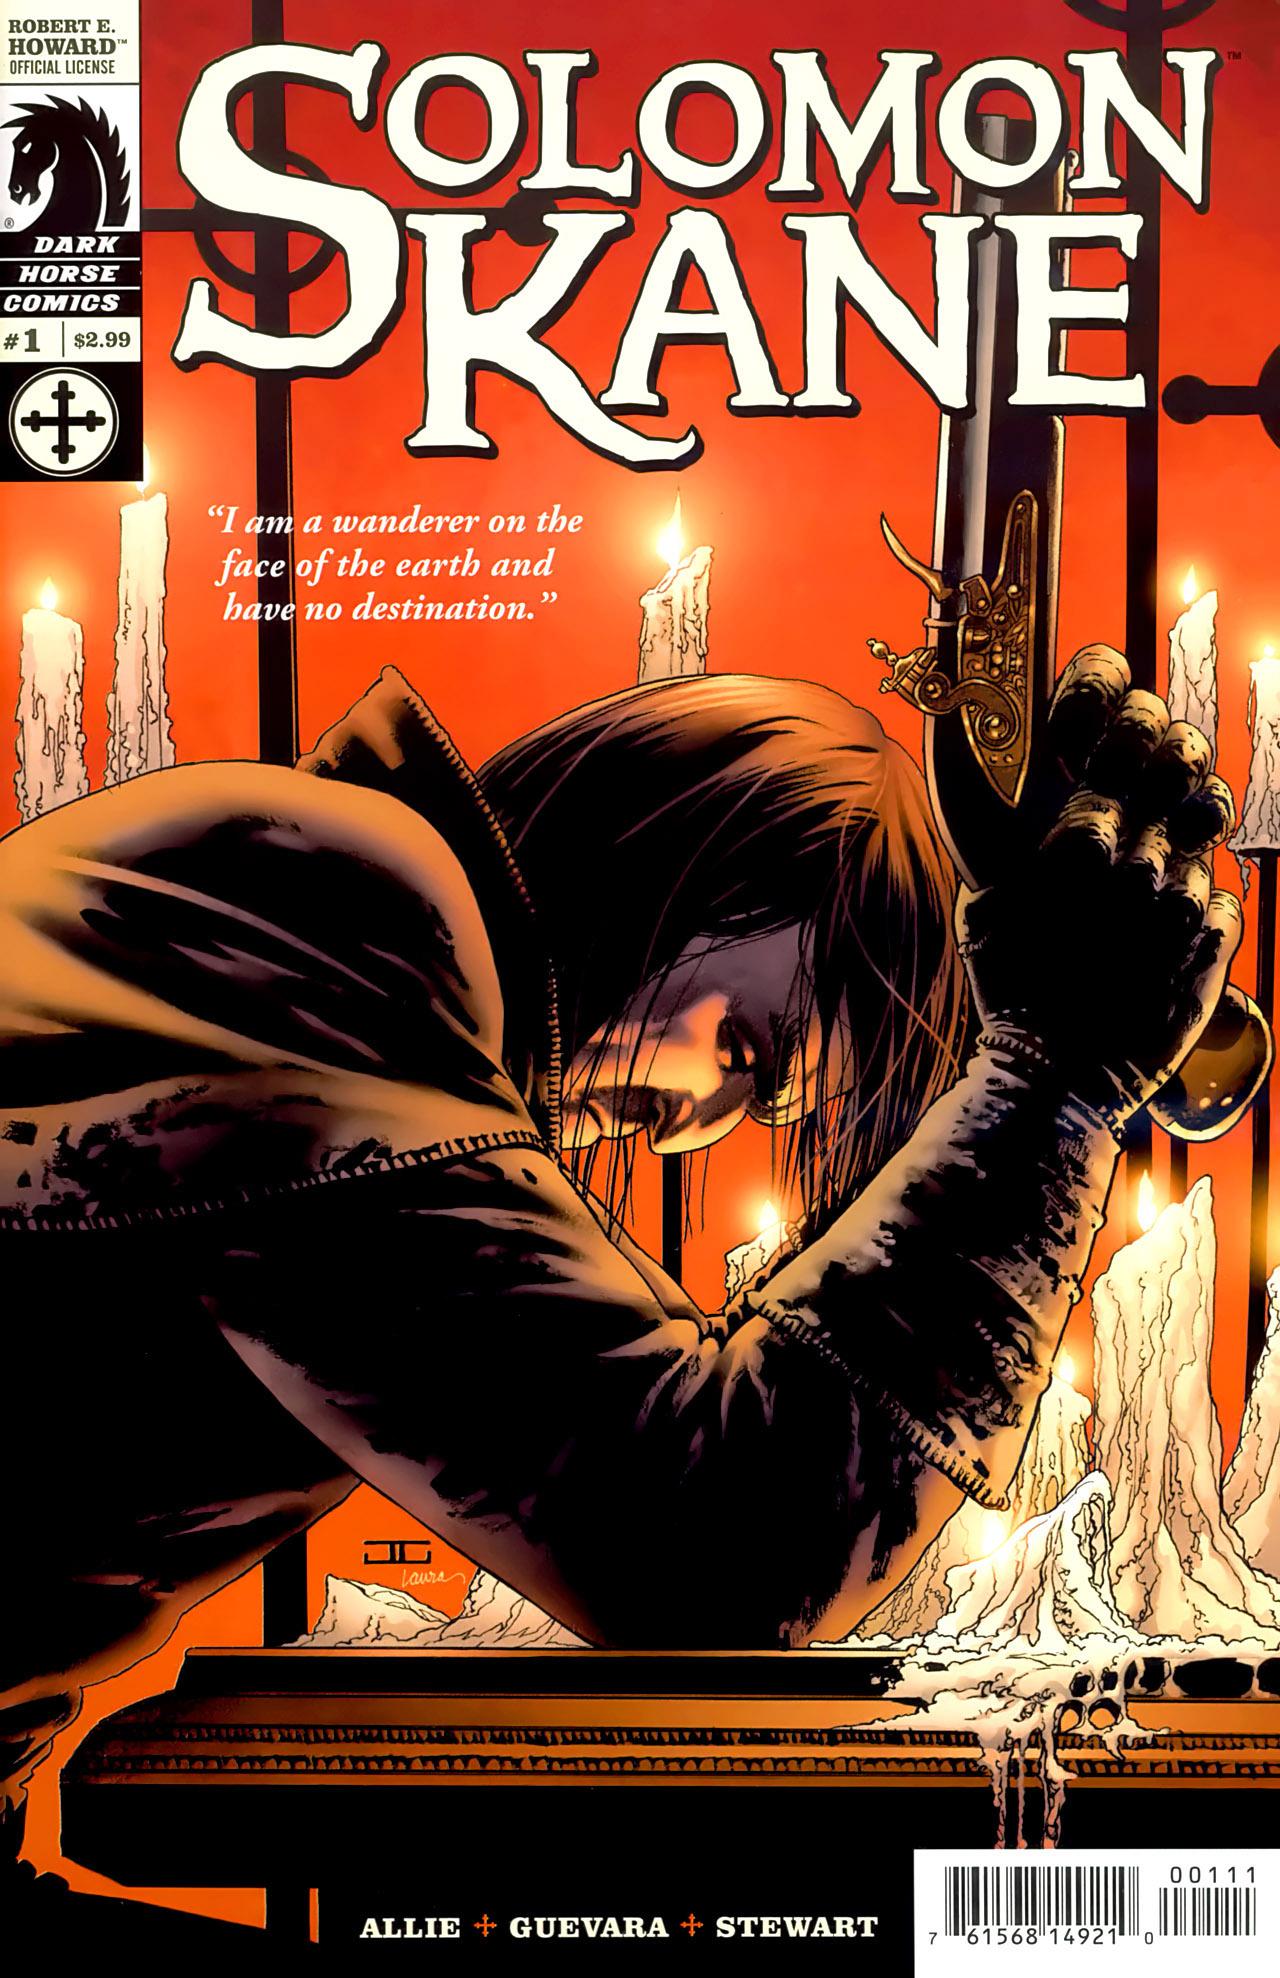 Read online Solomon Kane comic -  Issue #1 - 1